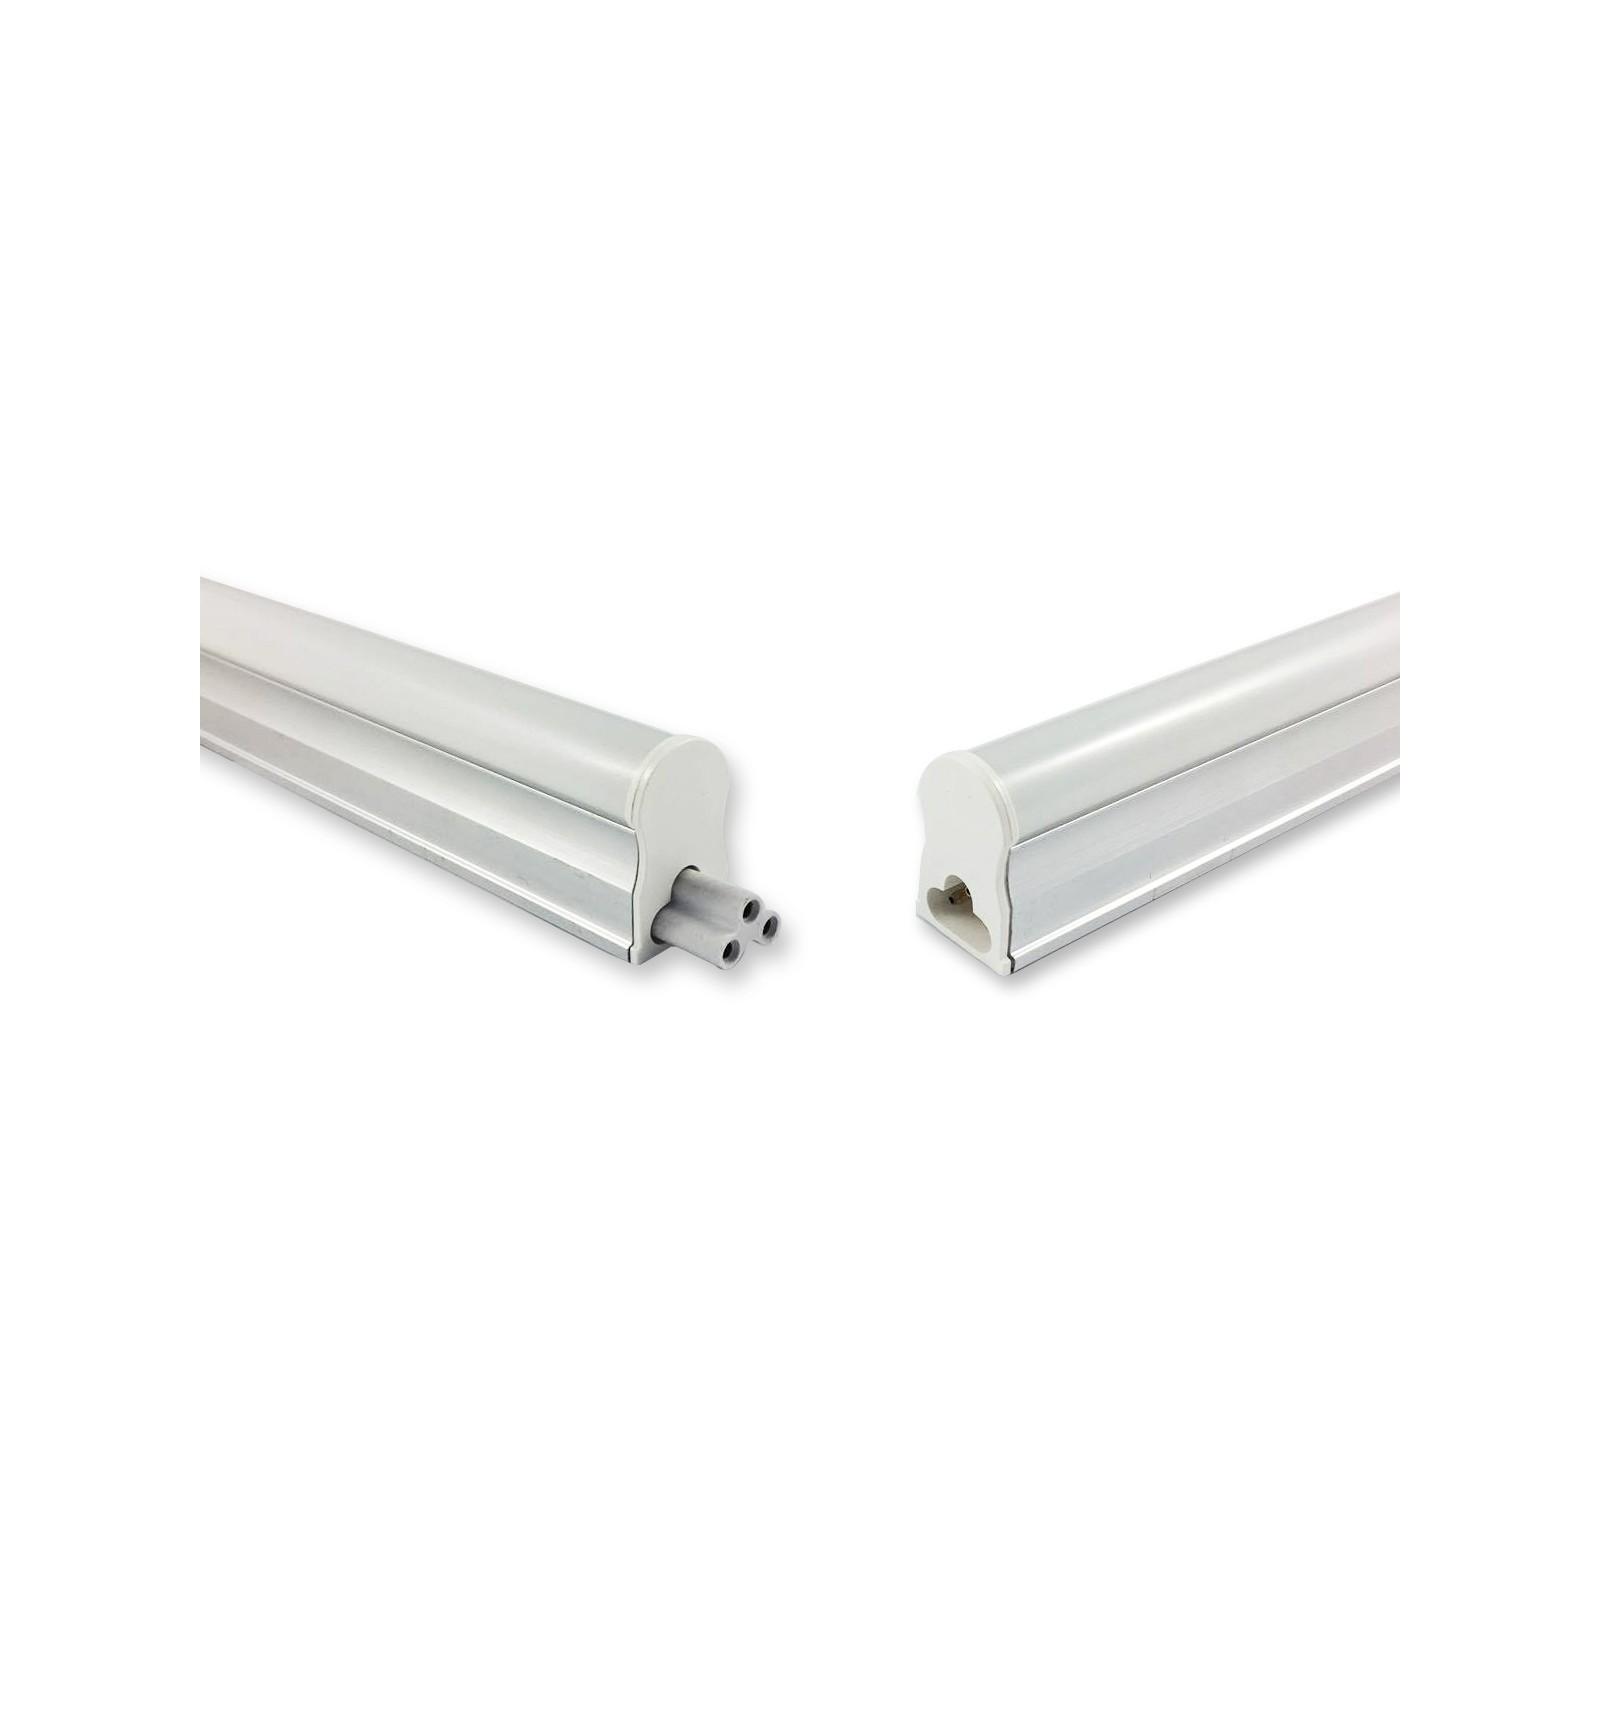 tube led t5 8w blanc chaud 3000k longueur 60cm. Black Bedroom Furniture Sets. Home Design Ideas